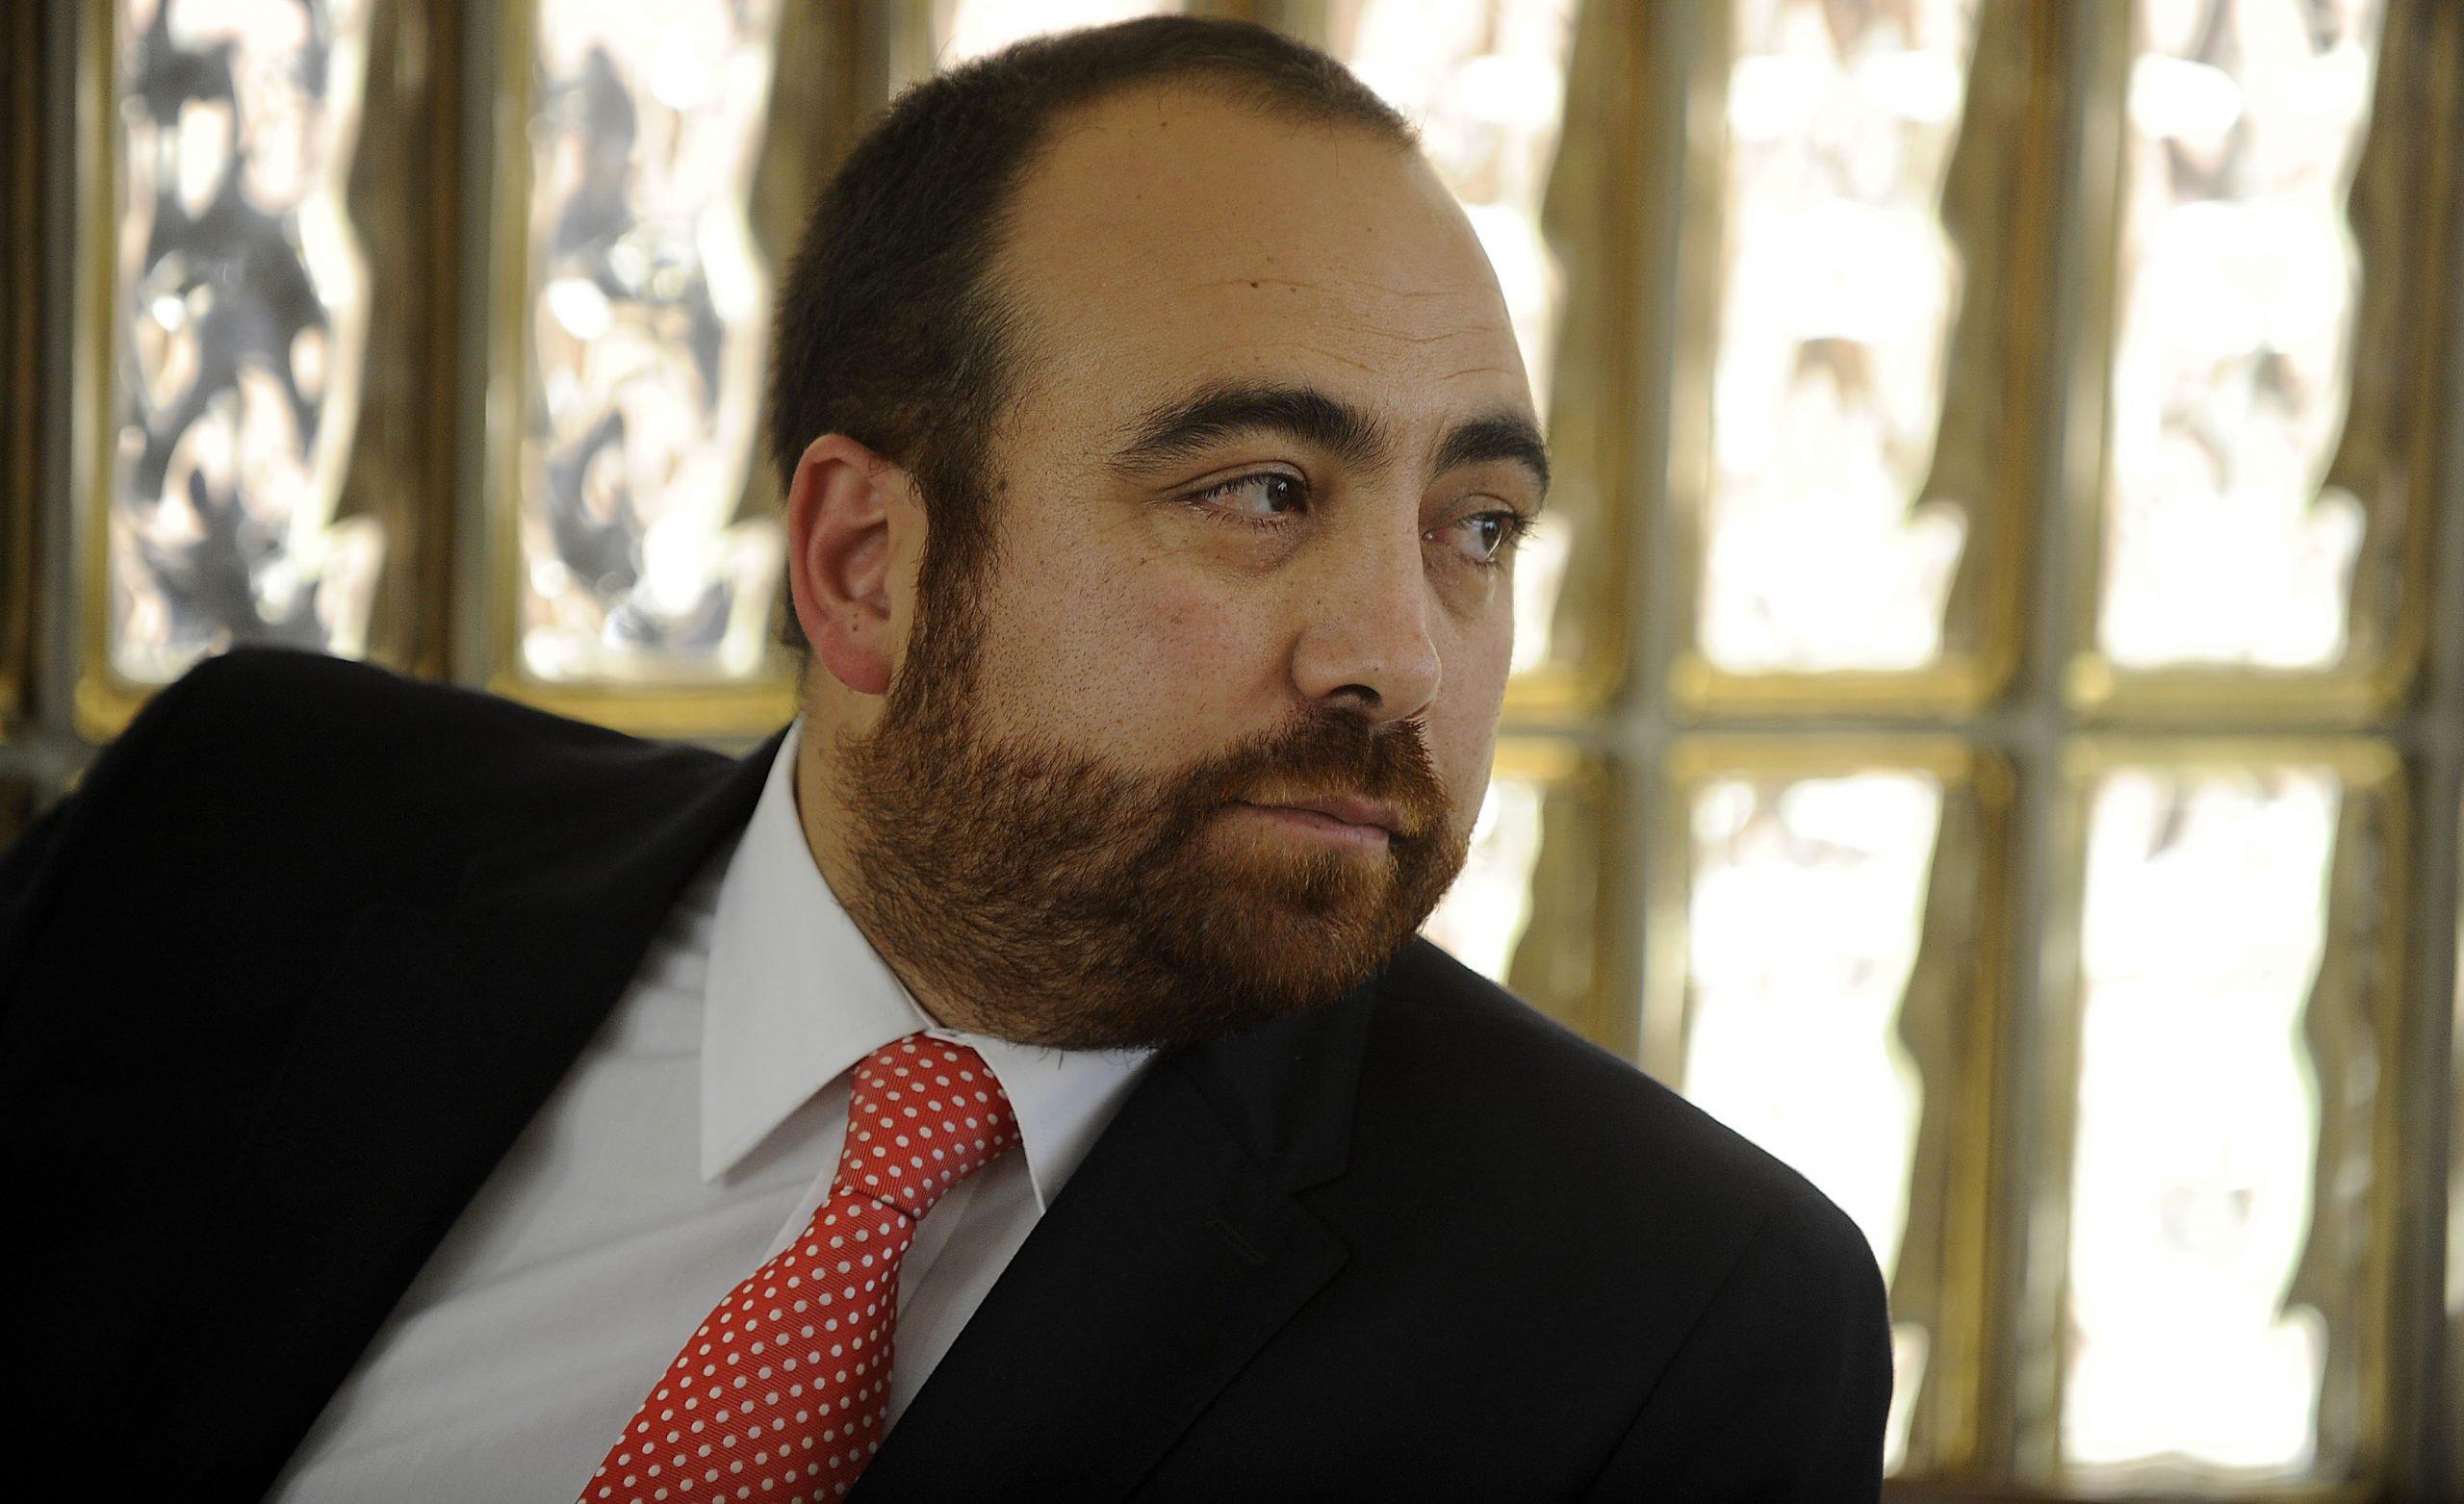 Fuad Chahín: Pésimo manejo de pandemia y «boicot a proceso constituyente»amerita acusación constitucional contra Piñera (audio exclusivo)